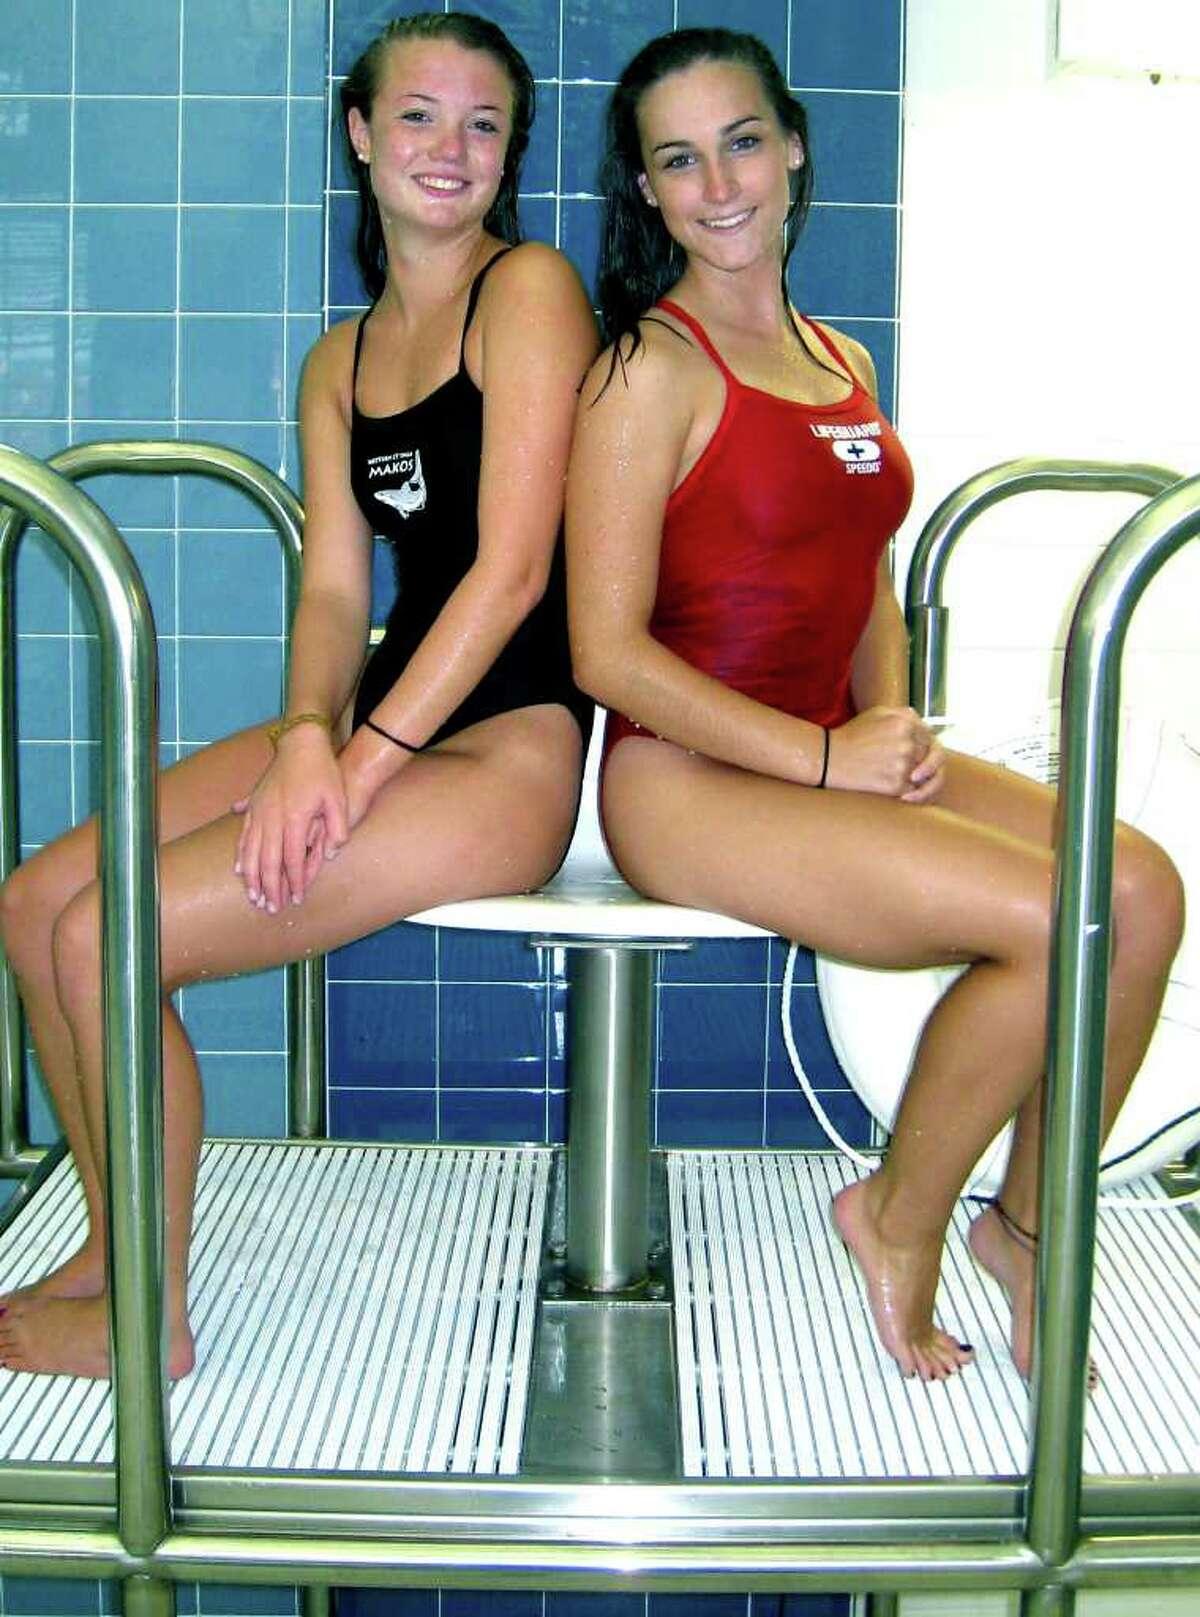 SPECTRUM/New Milford High School girls' swimming captains Danielle Cambareri and Jessica Cochrane, Sept. 2, 2010.